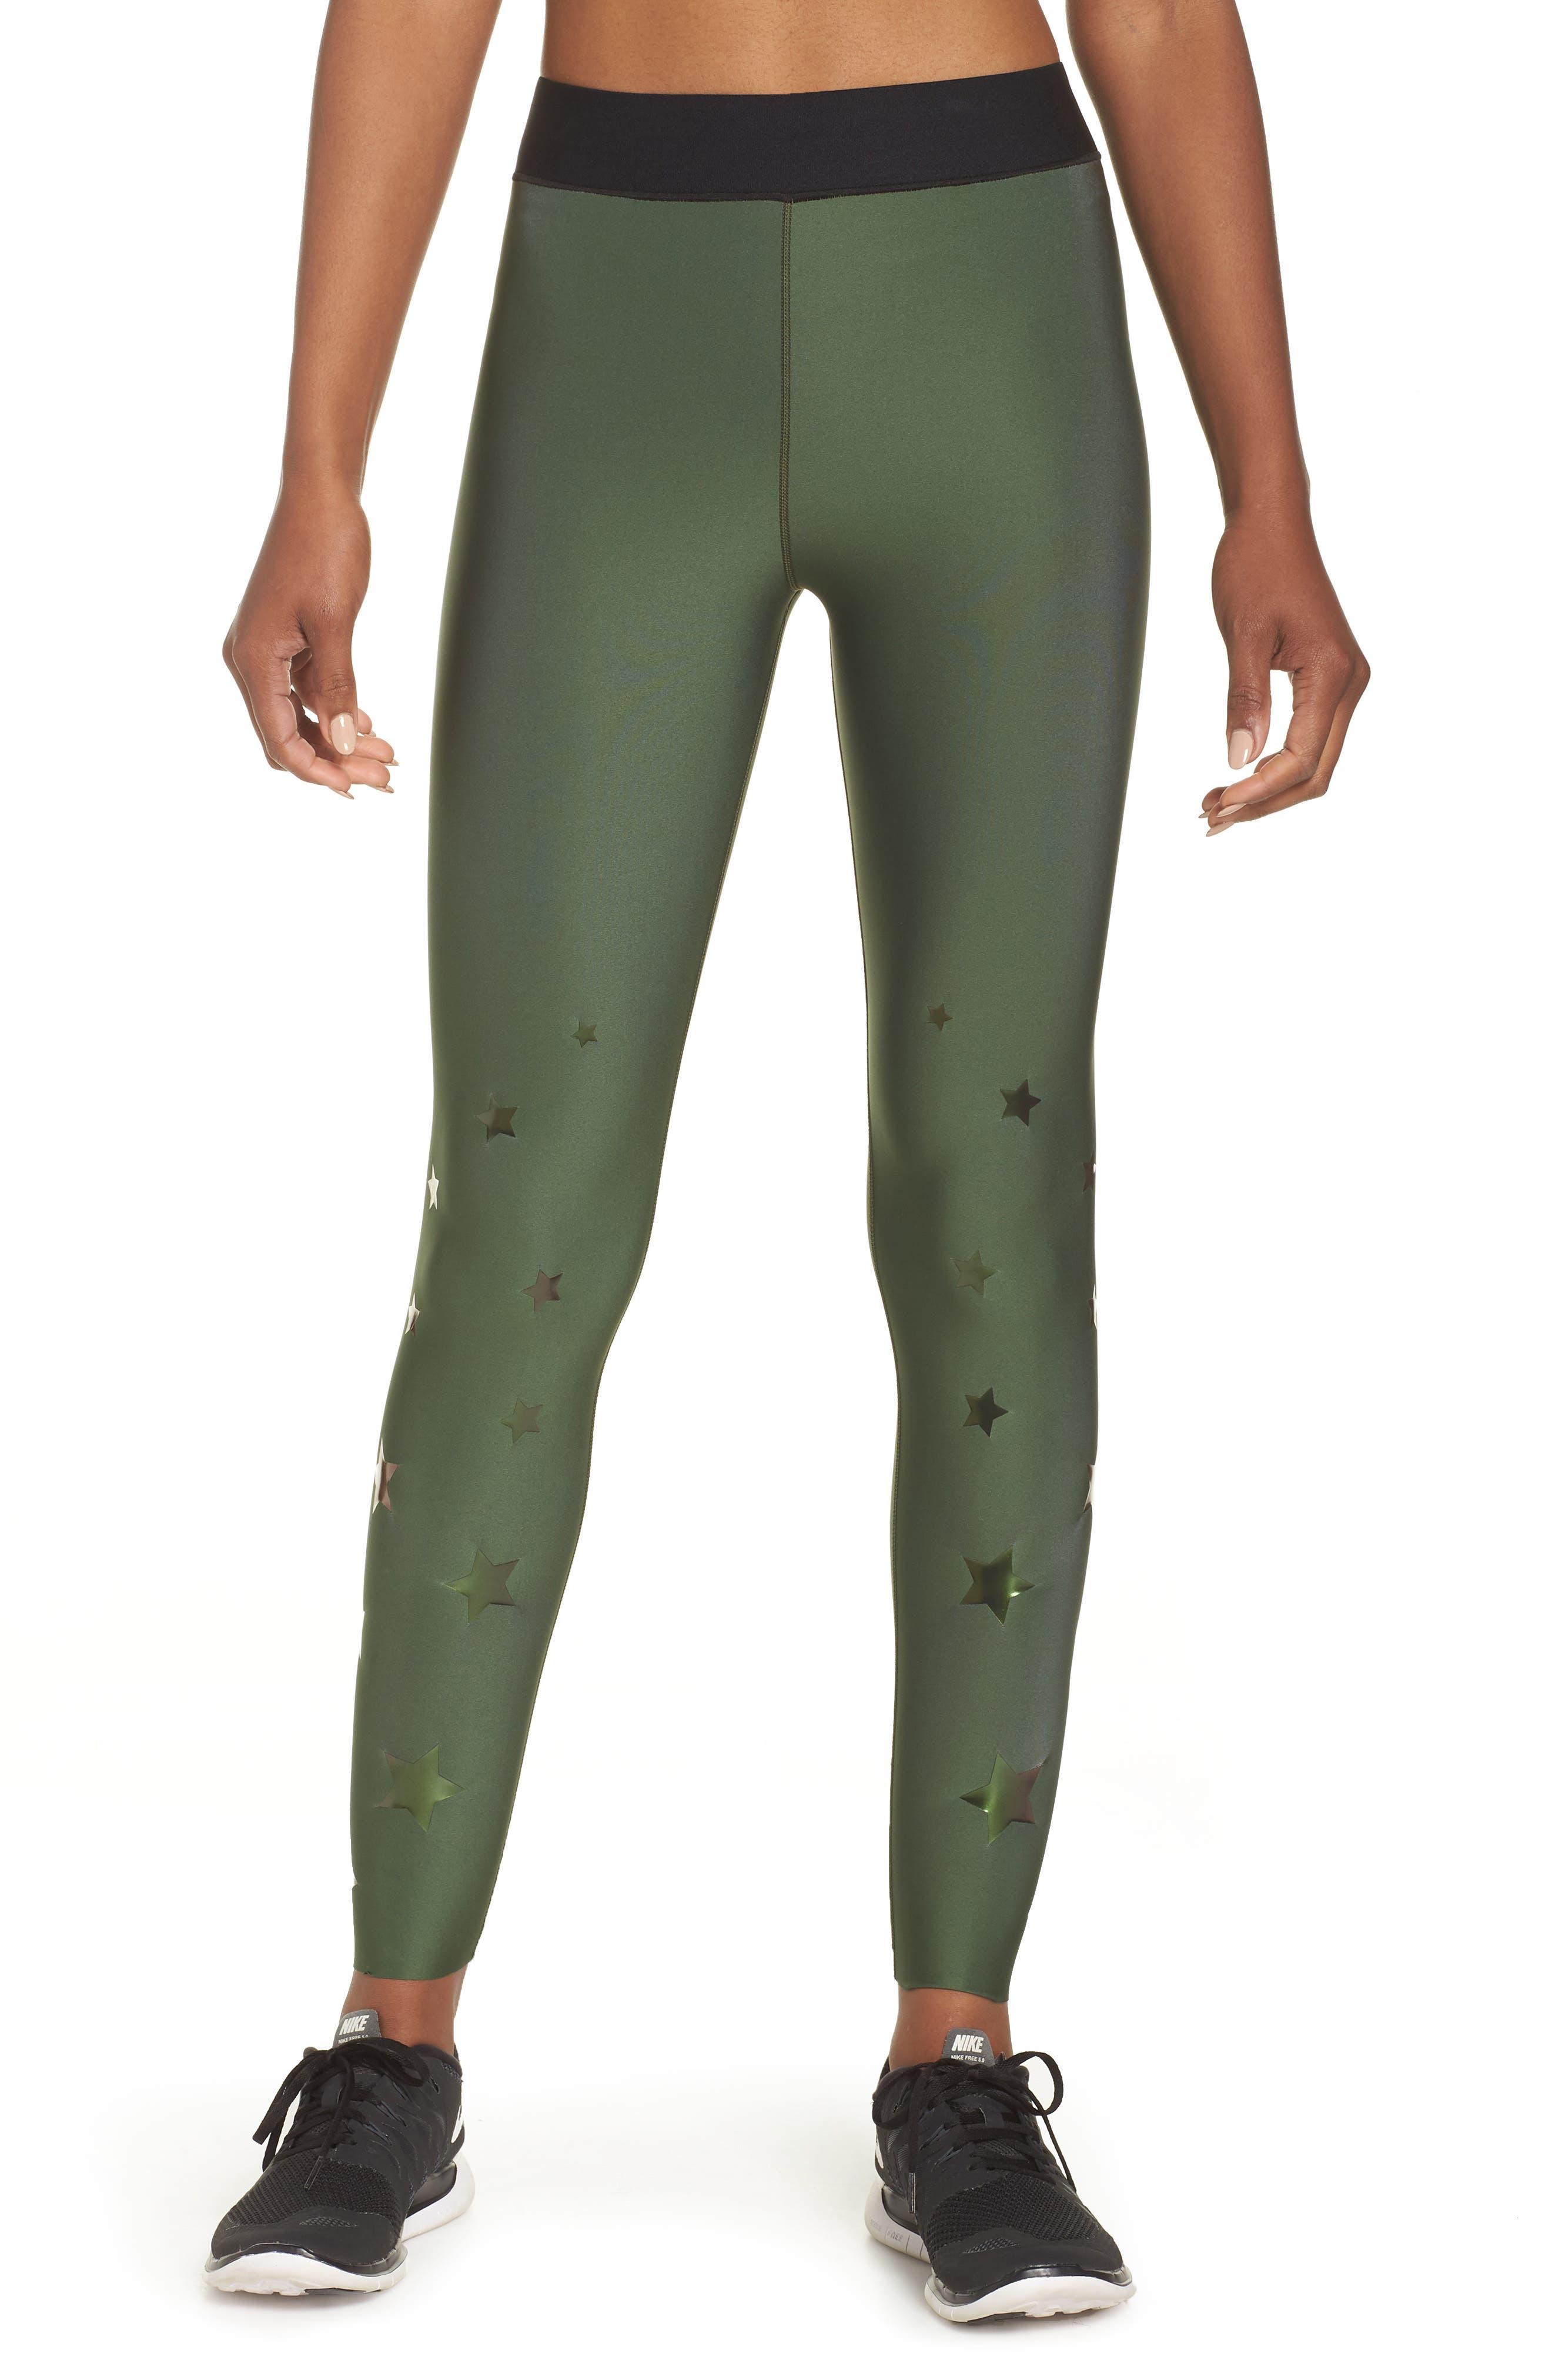 Ultra Luster Leggings,                             Main thumbnail 1, color,                             Army Green Beetle